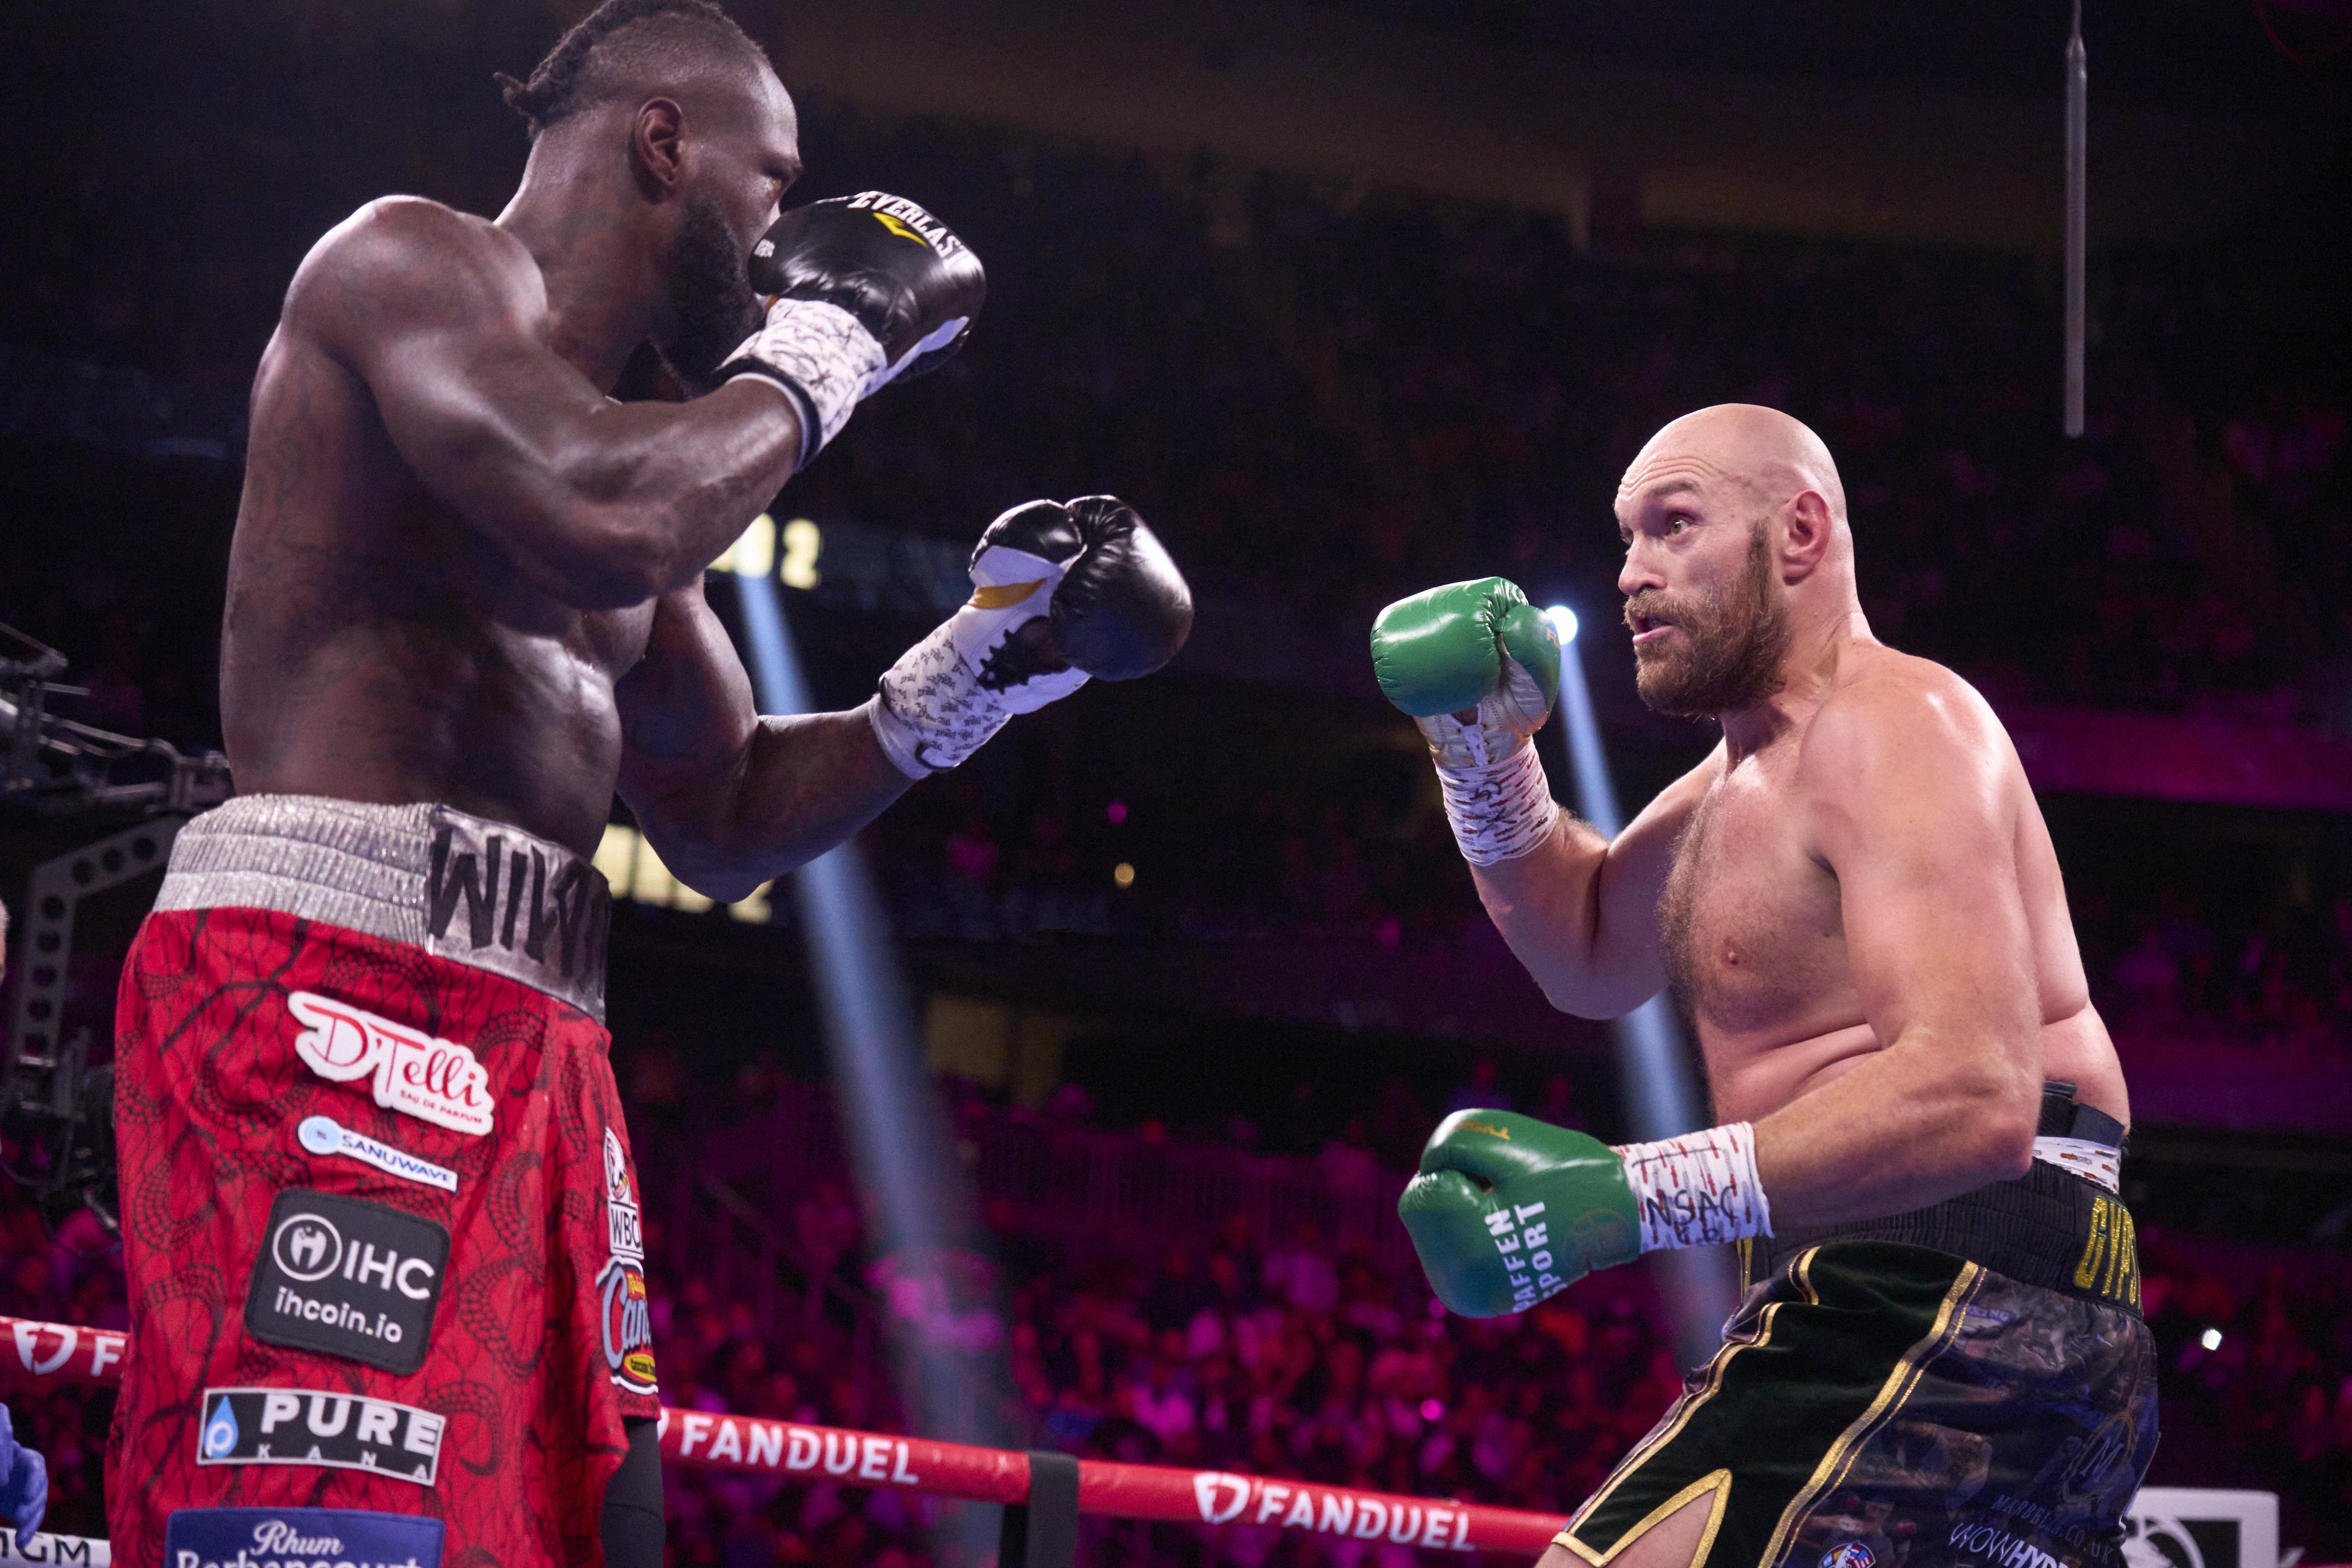 Tyson Fury vs Deontay Wilder, 2021 WBC Heavyweight Title